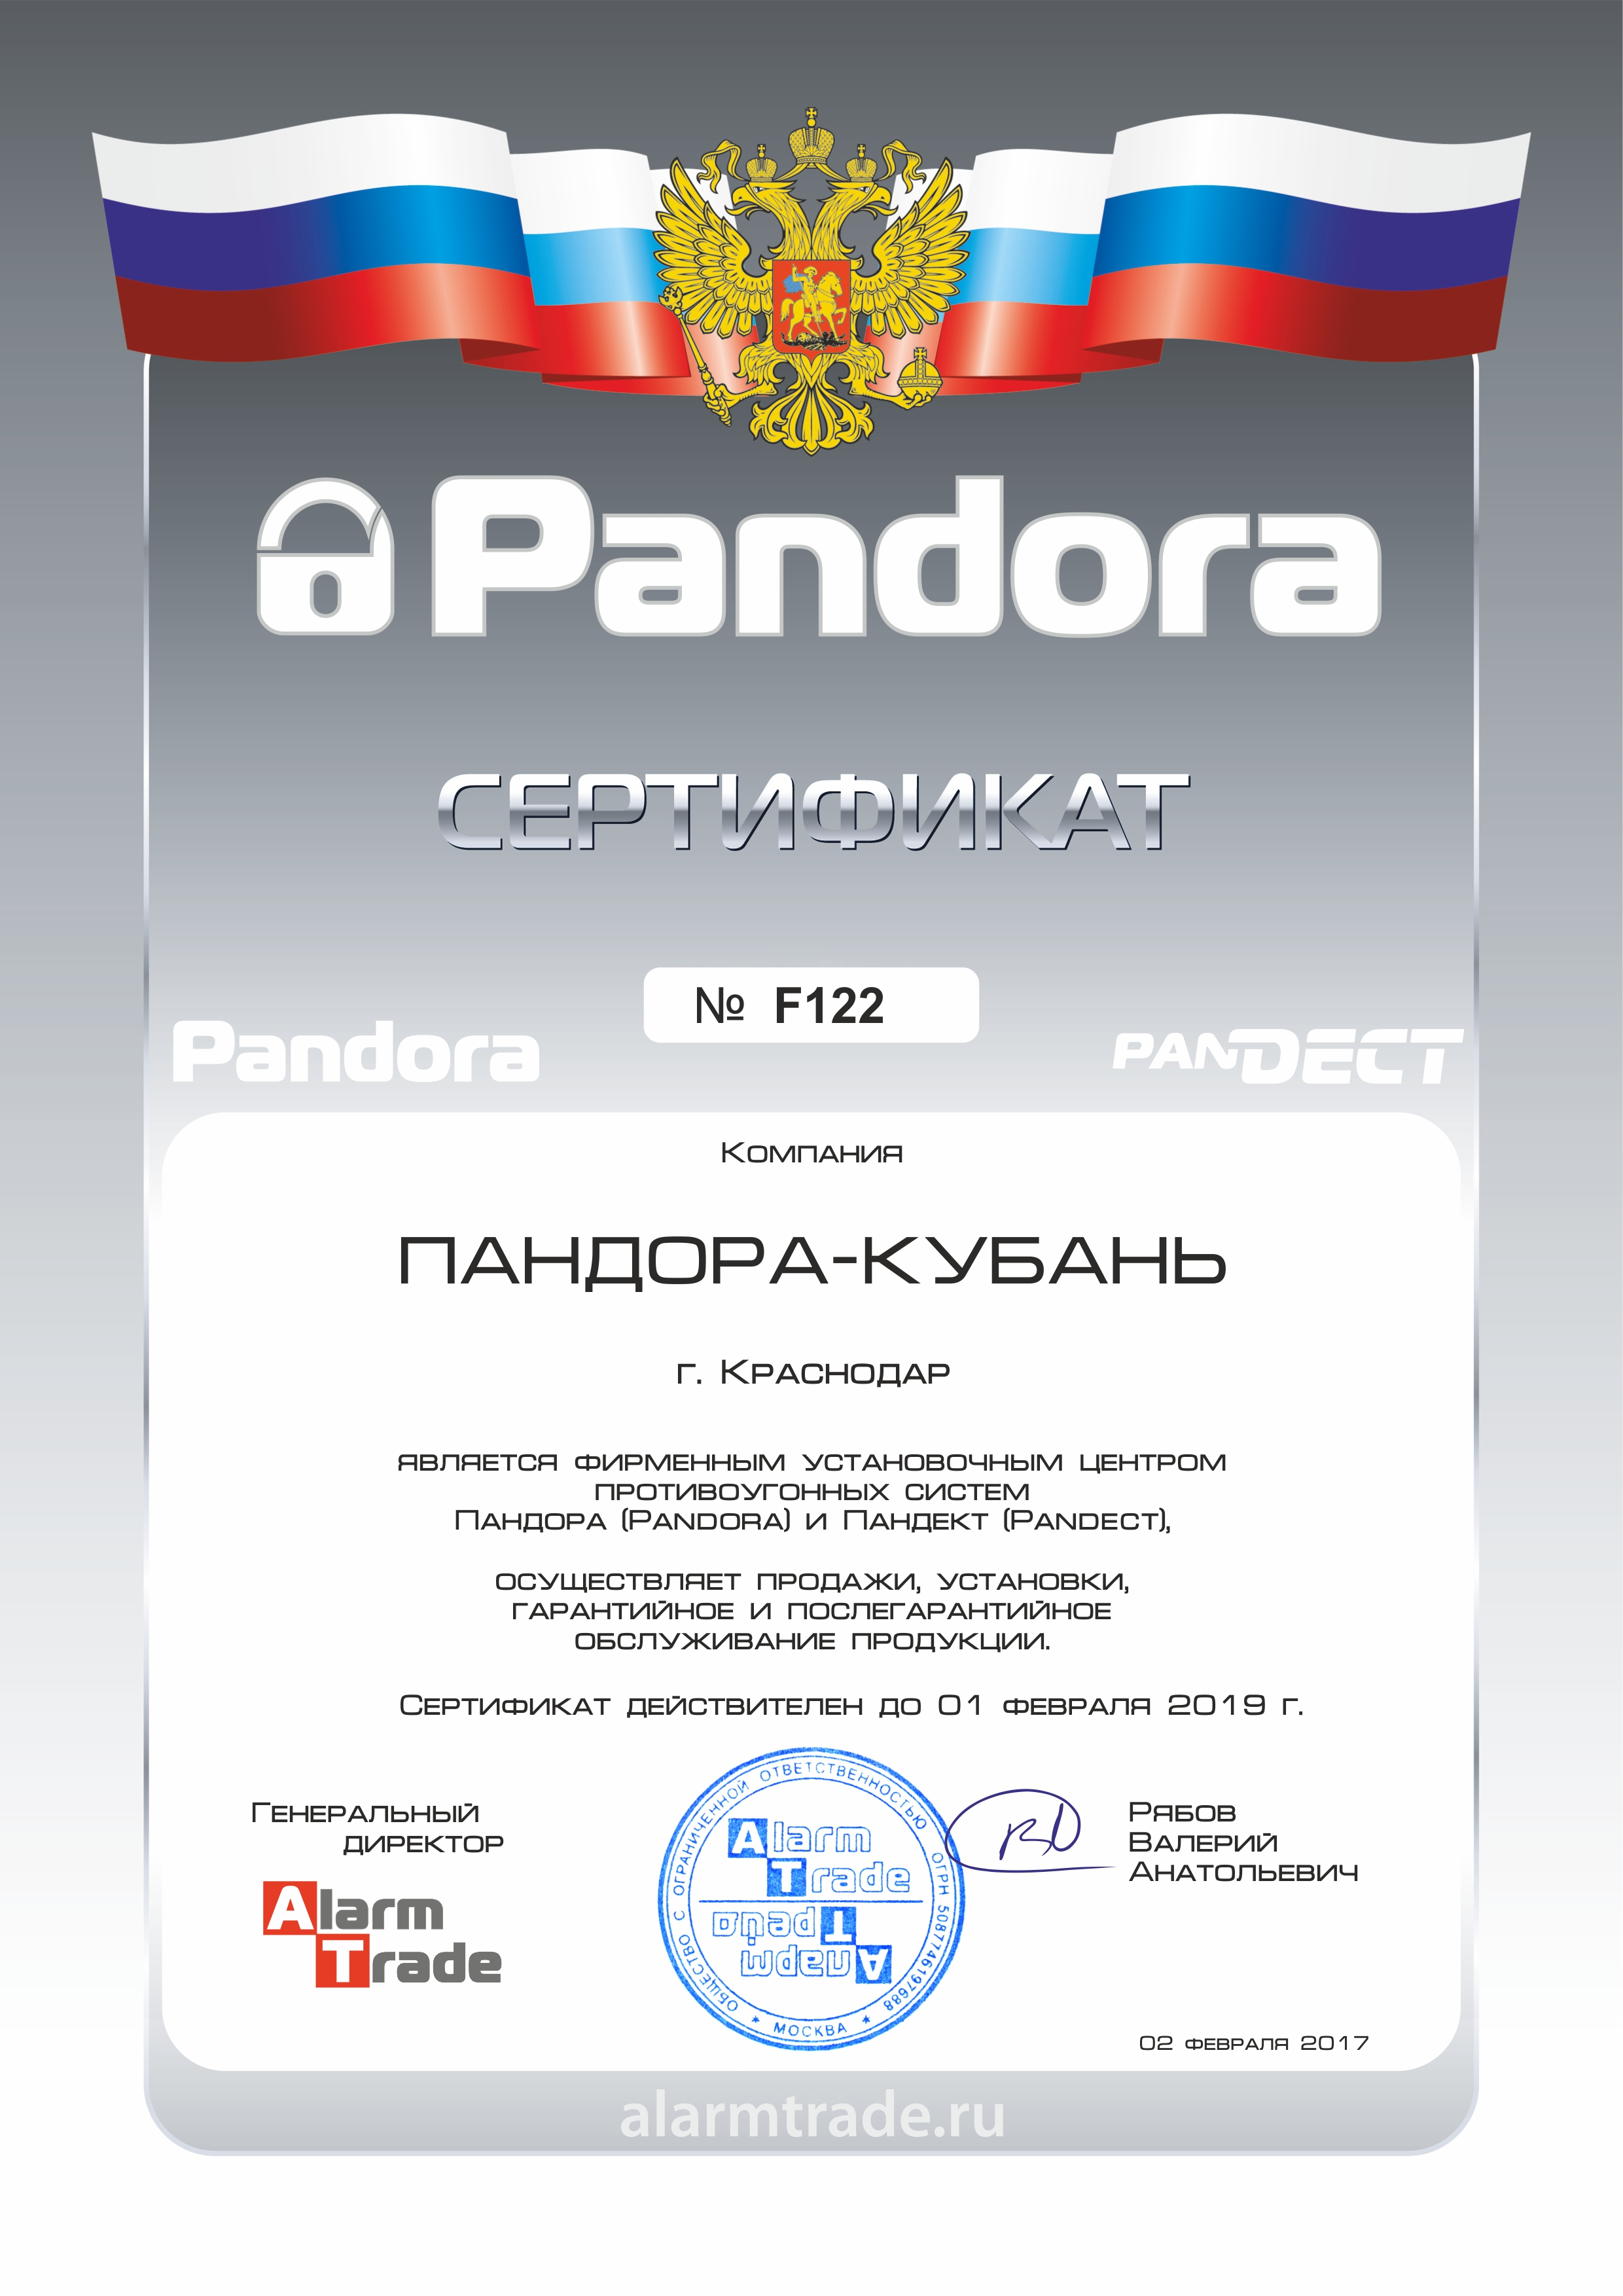 D233-17-03-Пандора-Кубань-Краснодар